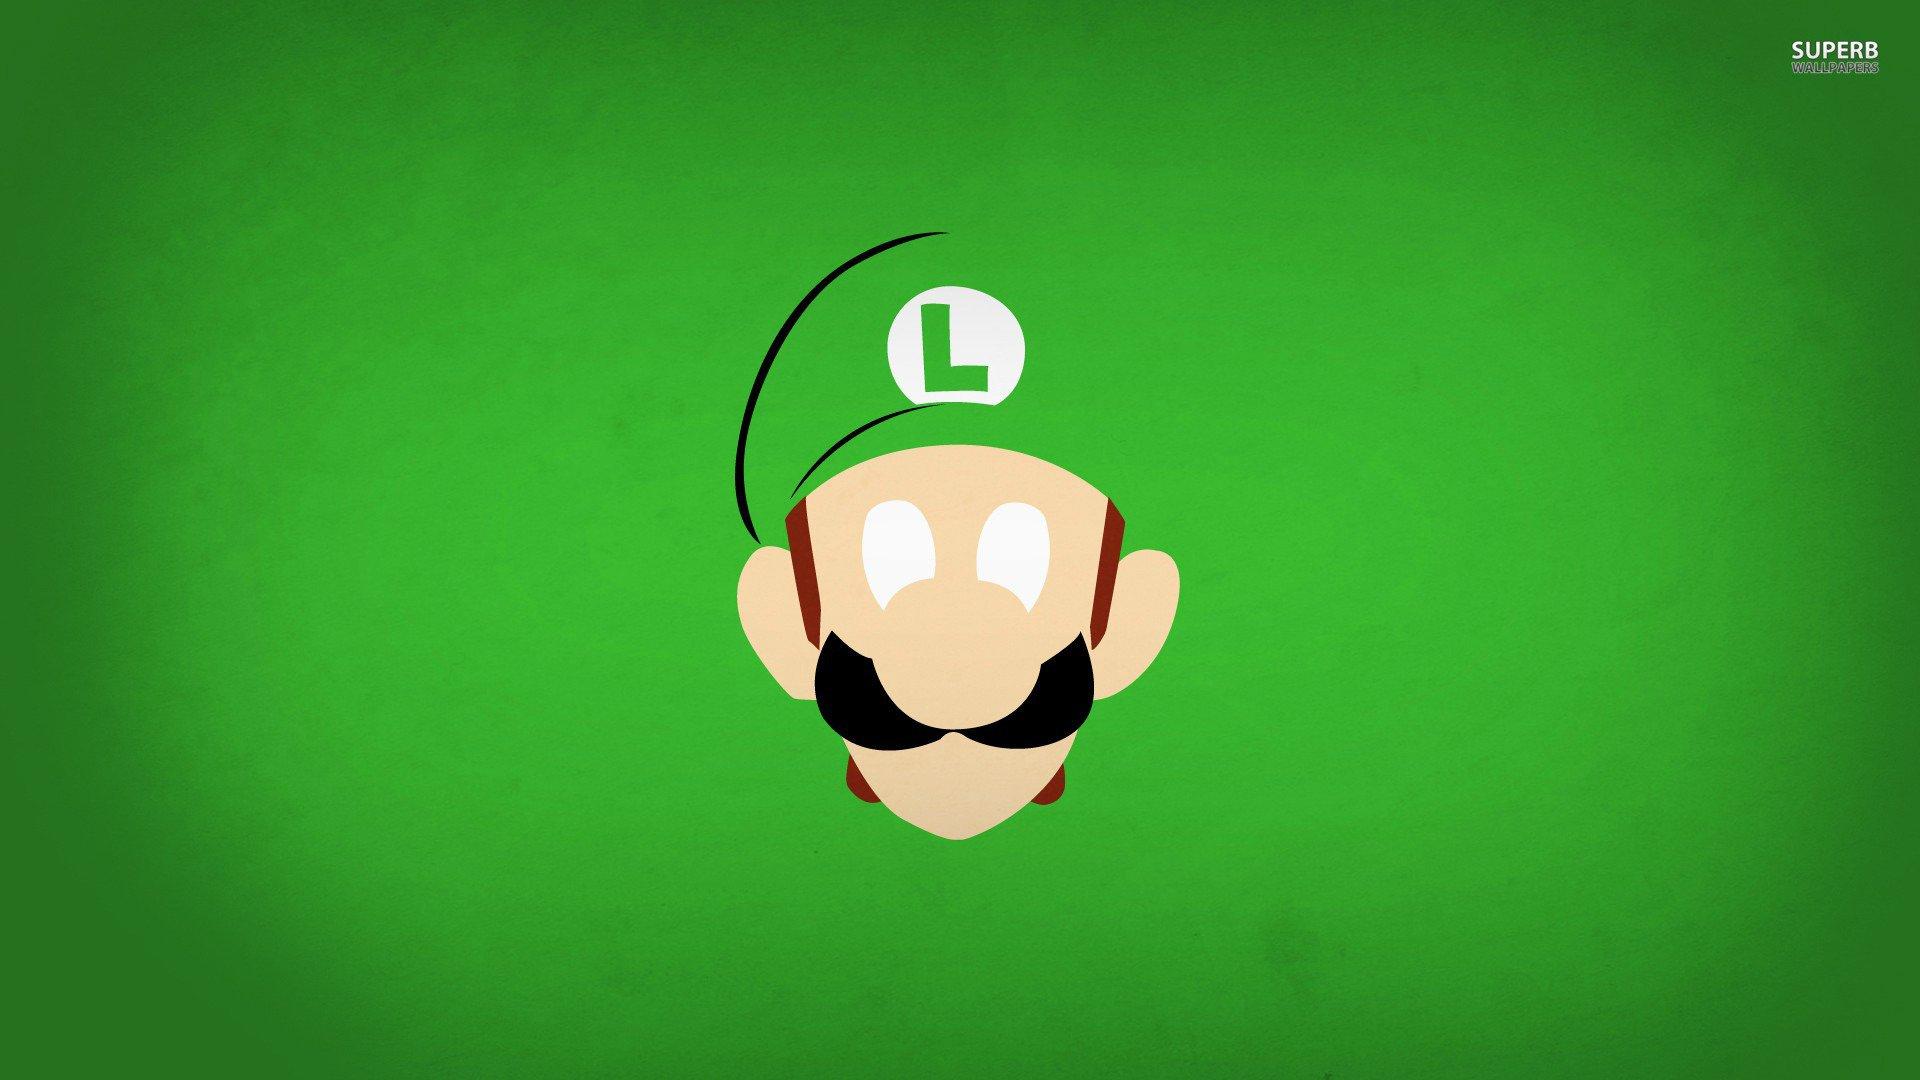 15 New Super Luigi U Hd Wallpapers Hintergrunde Wallpaper Abyss